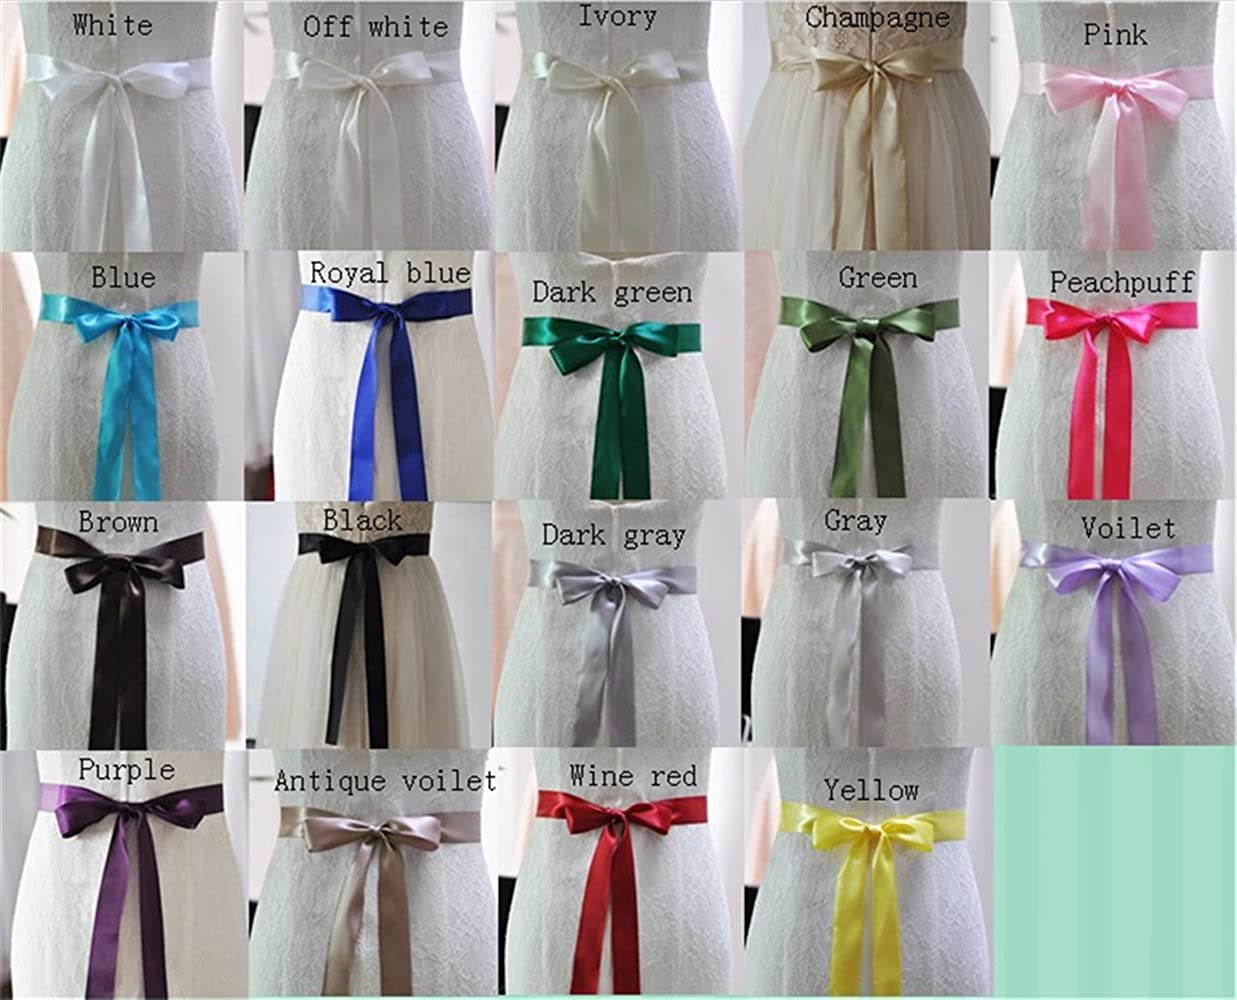 ULAPAN Womens Flowers Wedding Dress Belts Sash Pearls Bridal Belt Sashes